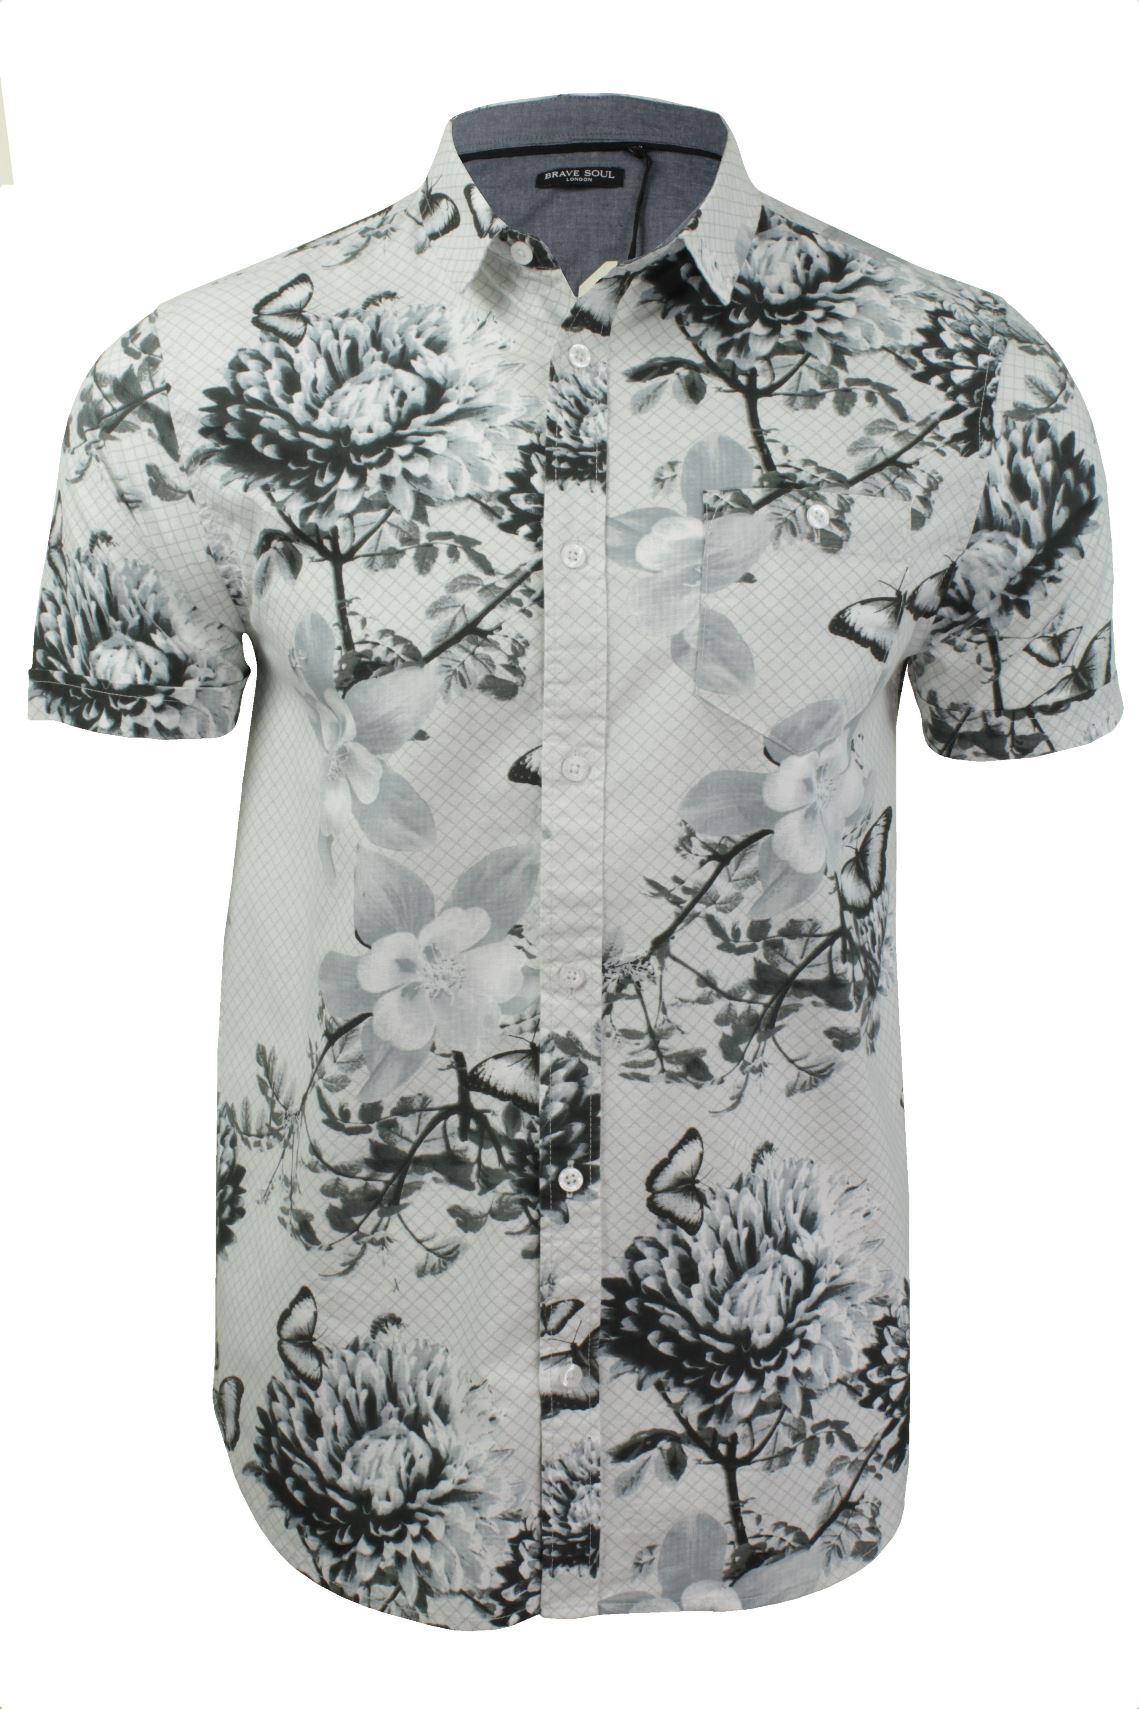 Mens hawaiian floral shirt by brave soul short sleeved ebay for Mens short sleeve floral shirt